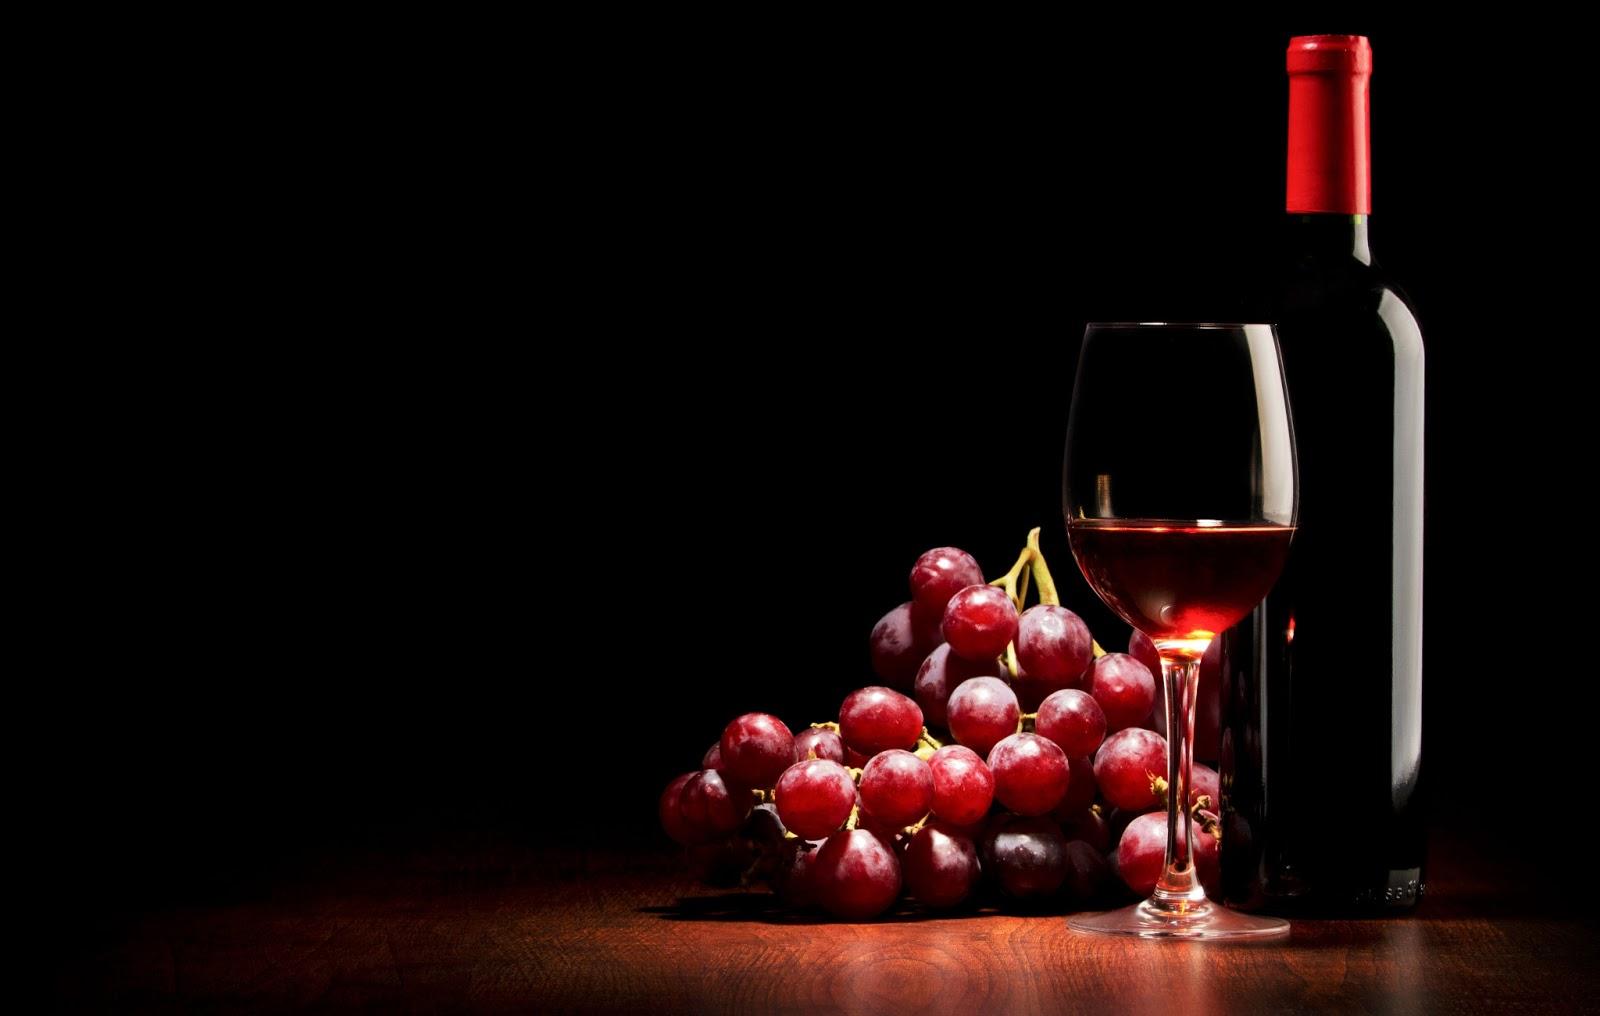 Wine Hd Wallpapers Wallpaper202